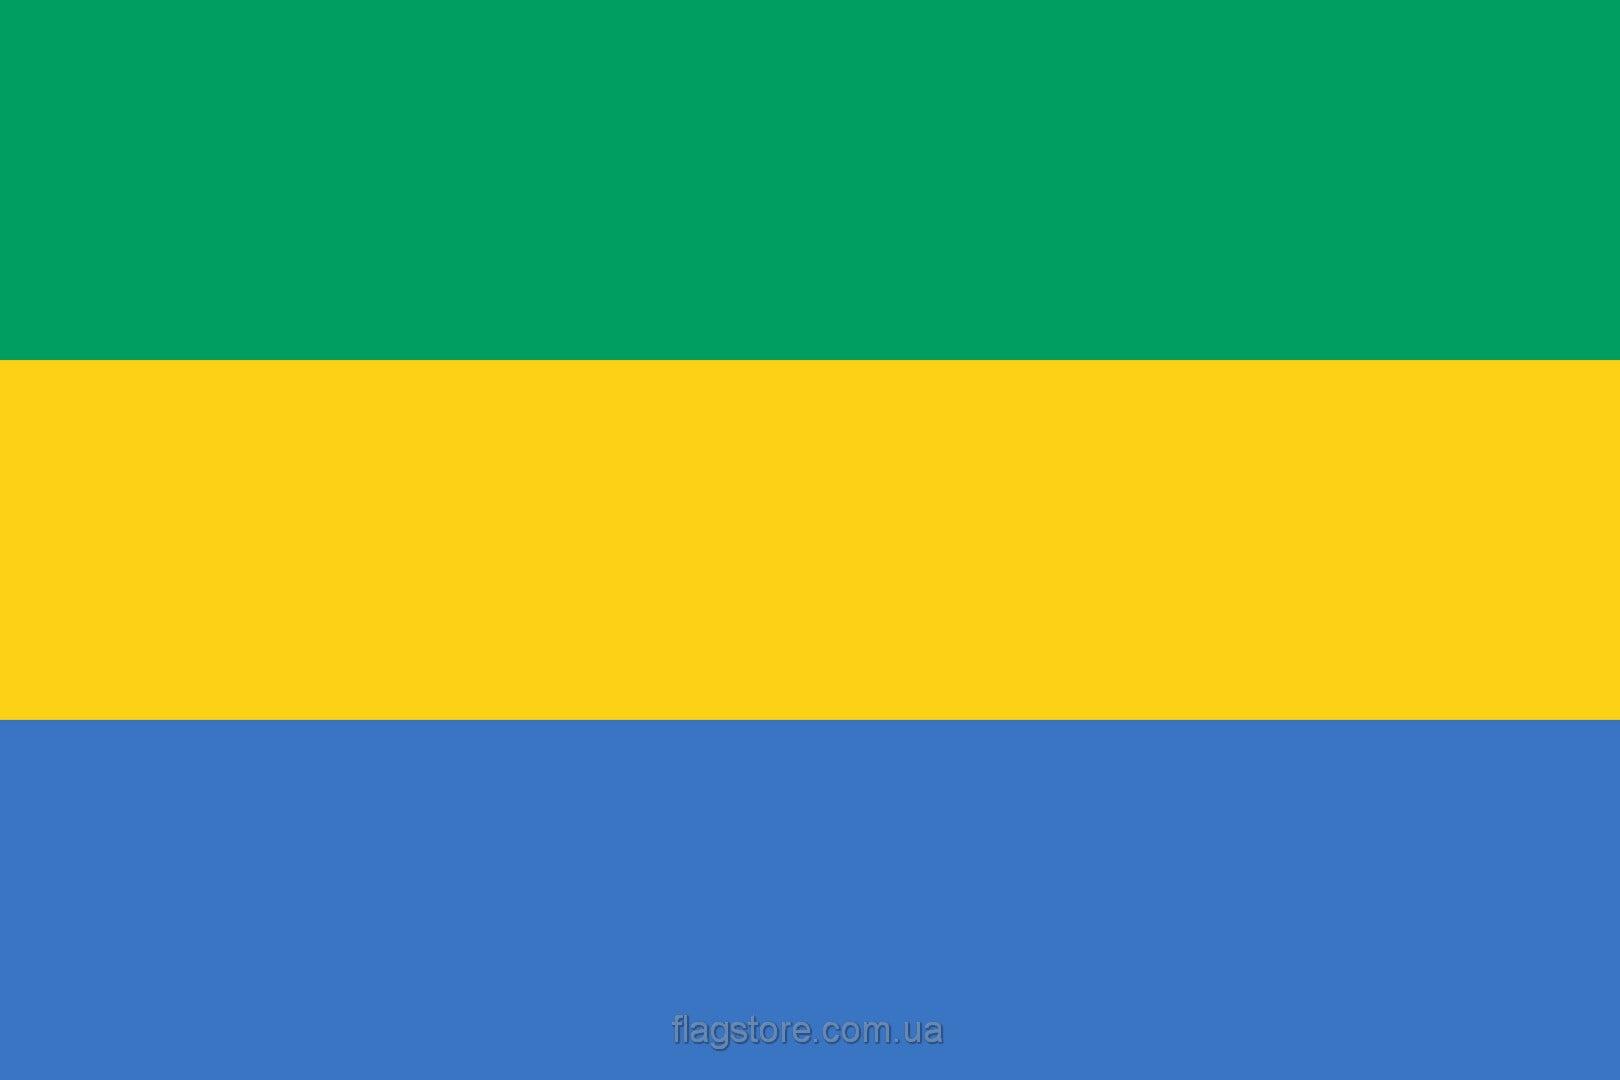 Купить флаг Габона (страны Габон)